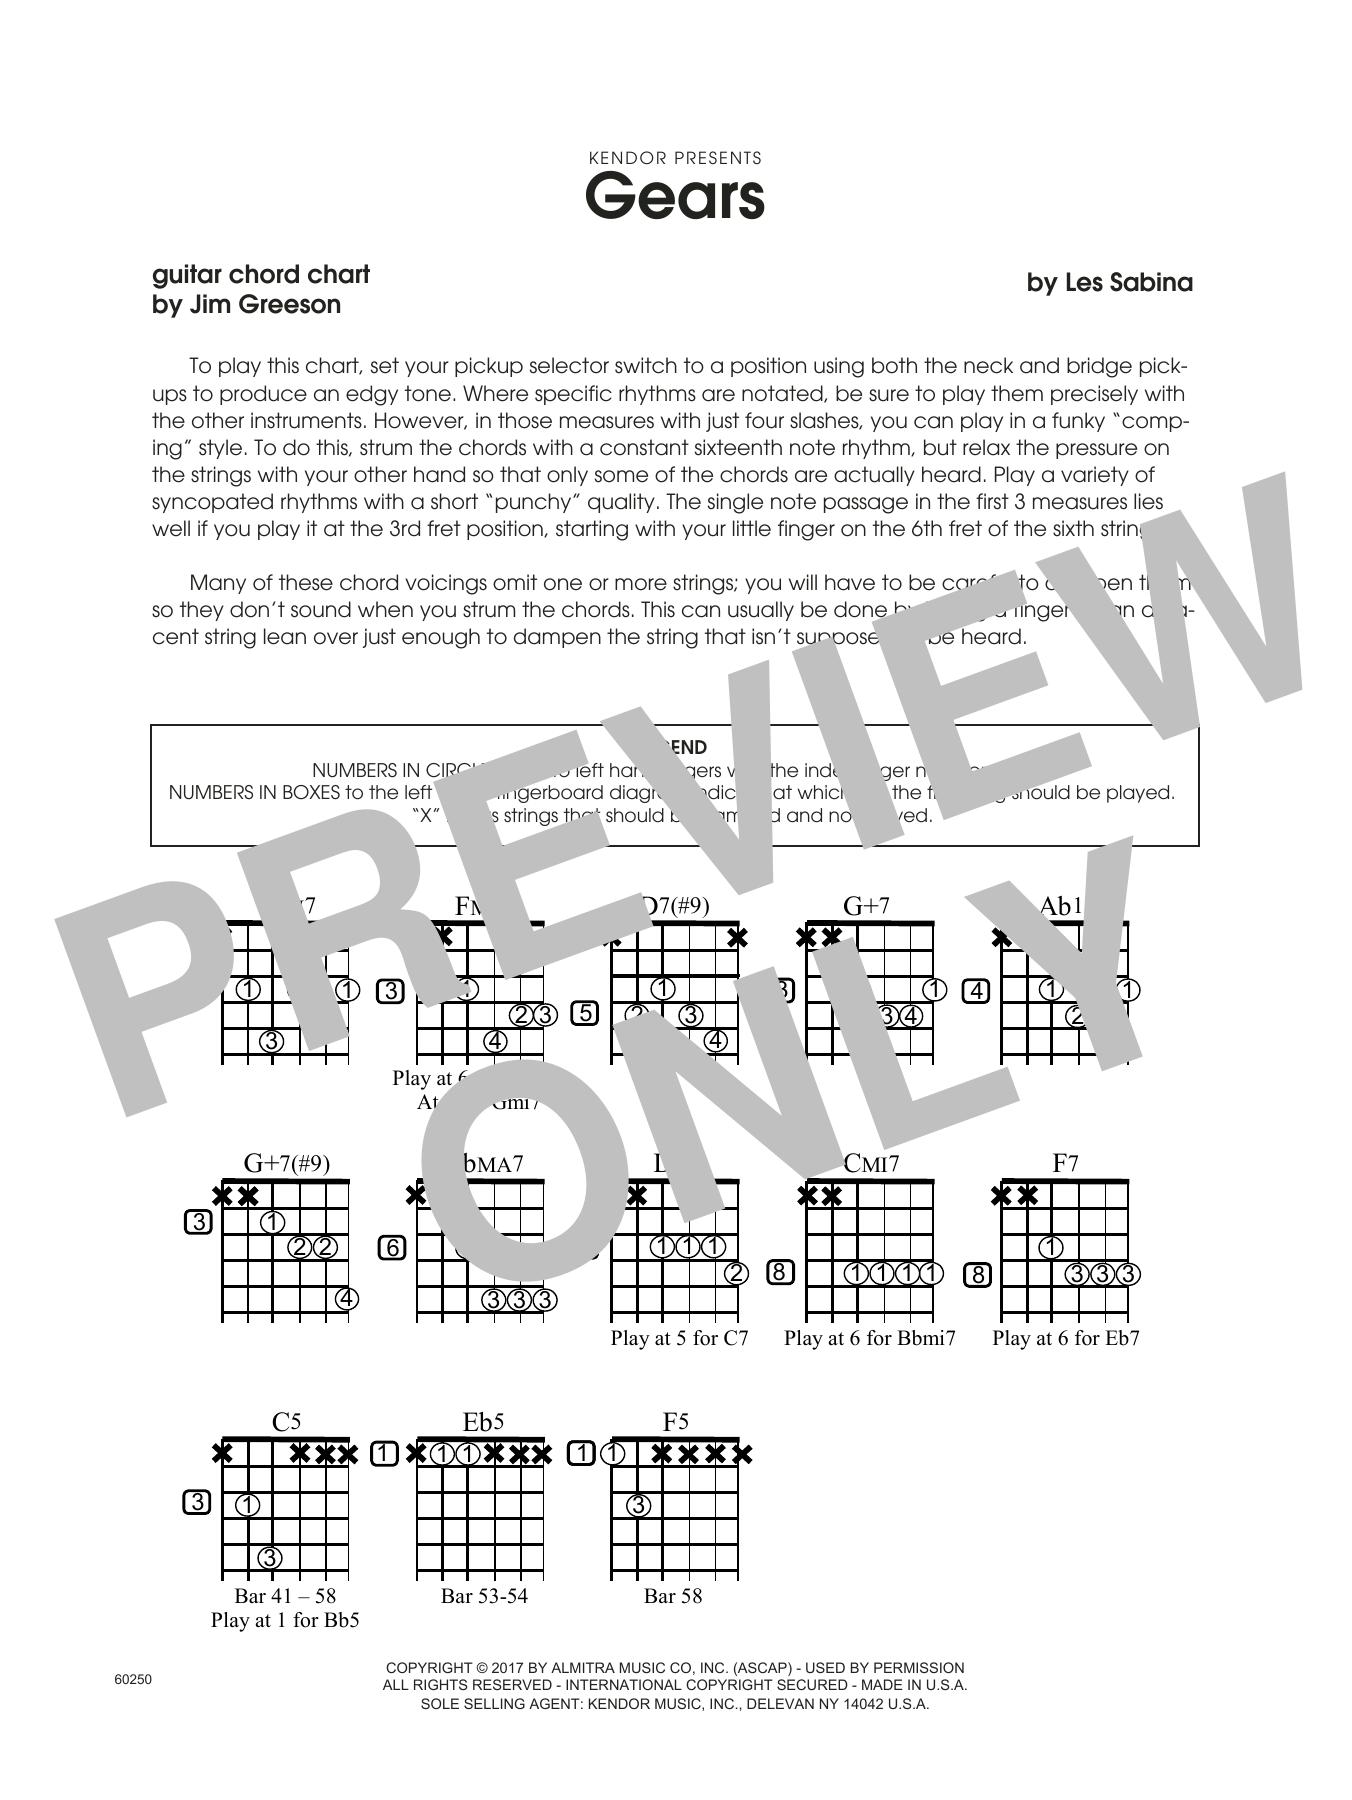 Les Sabina Gears - Guitar Chord Chart sheet music notes printable PDF score